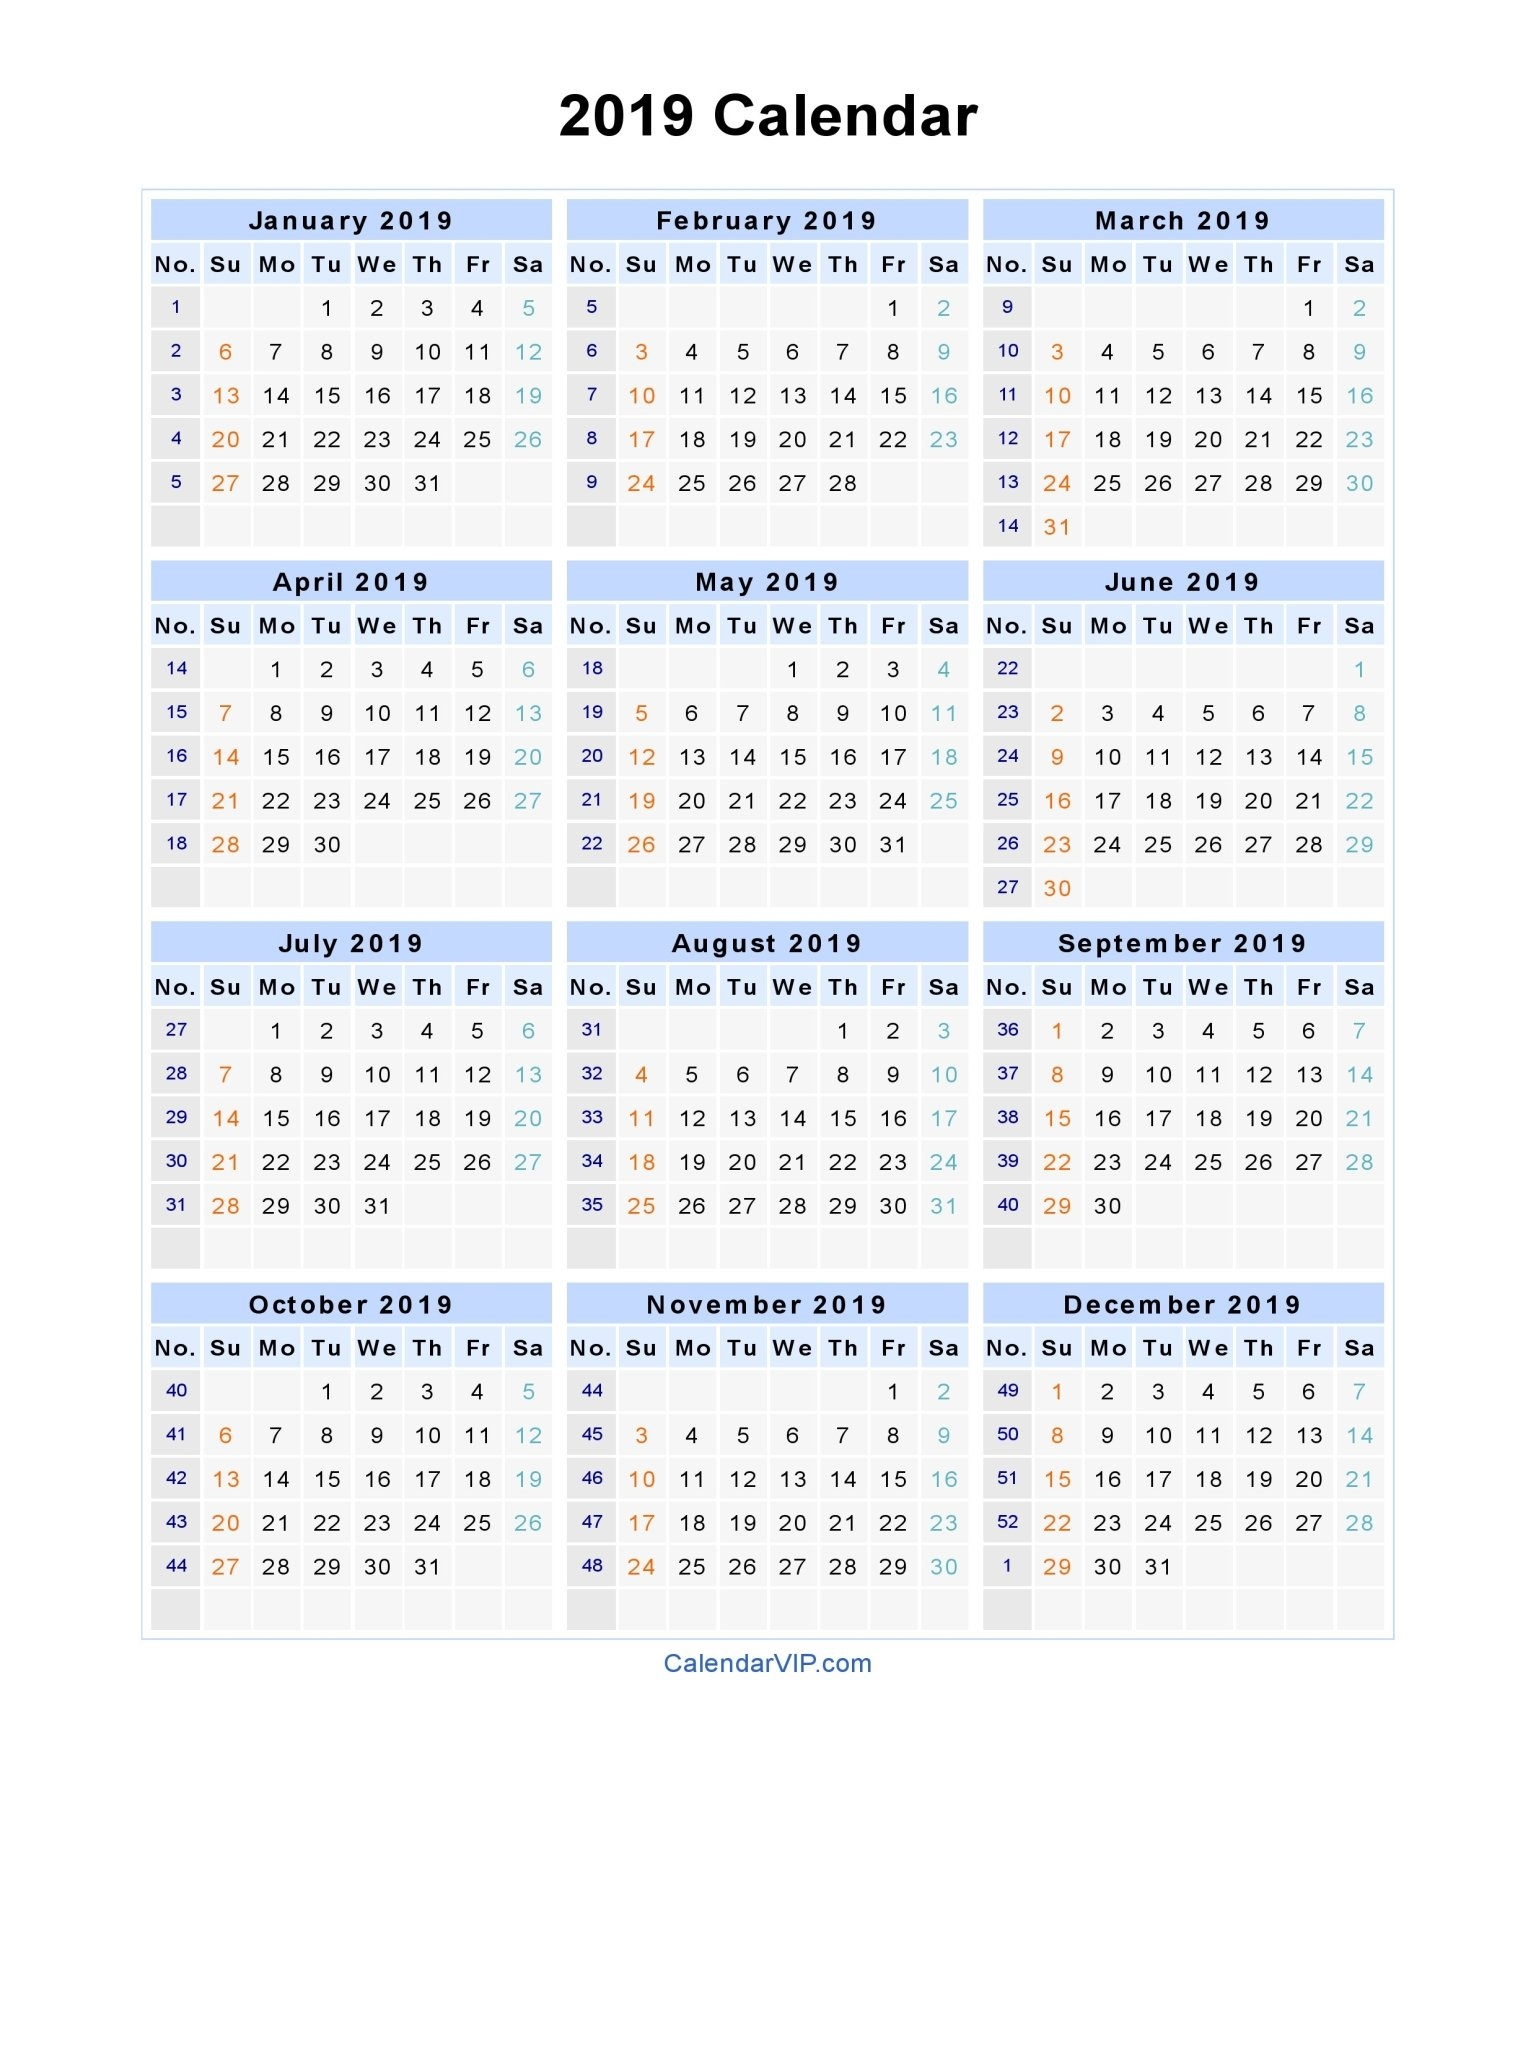 Printable Calendar 2019 Calendar Labs   Printable Calendar 2019 Calendar 2019 Calendarlabs